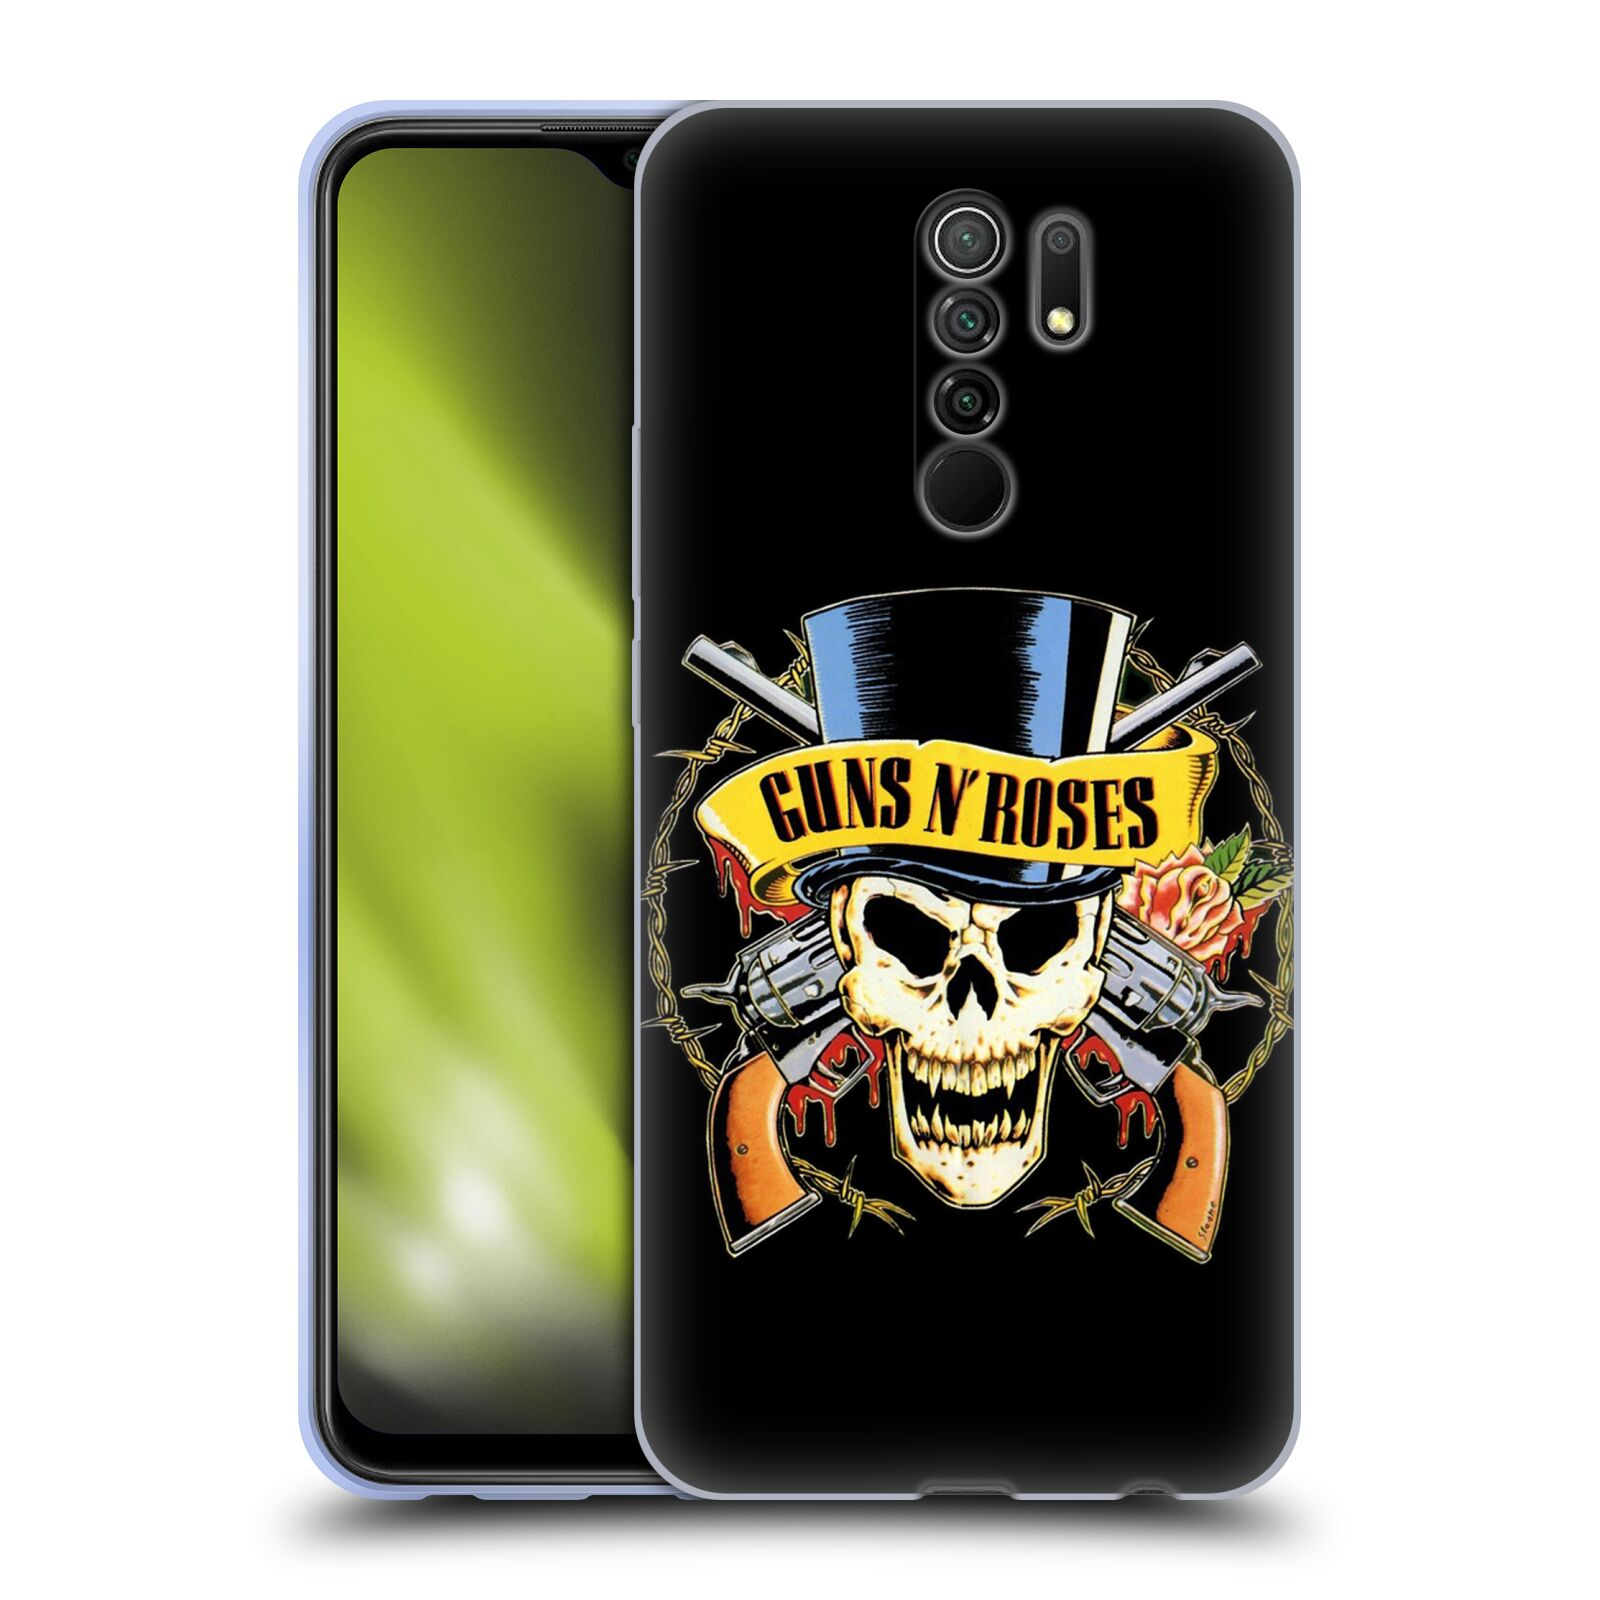 Silikonové pouzdro na mobil Xiaomi Redmi 9 - Head Case - Guns N' Roses - Lebka